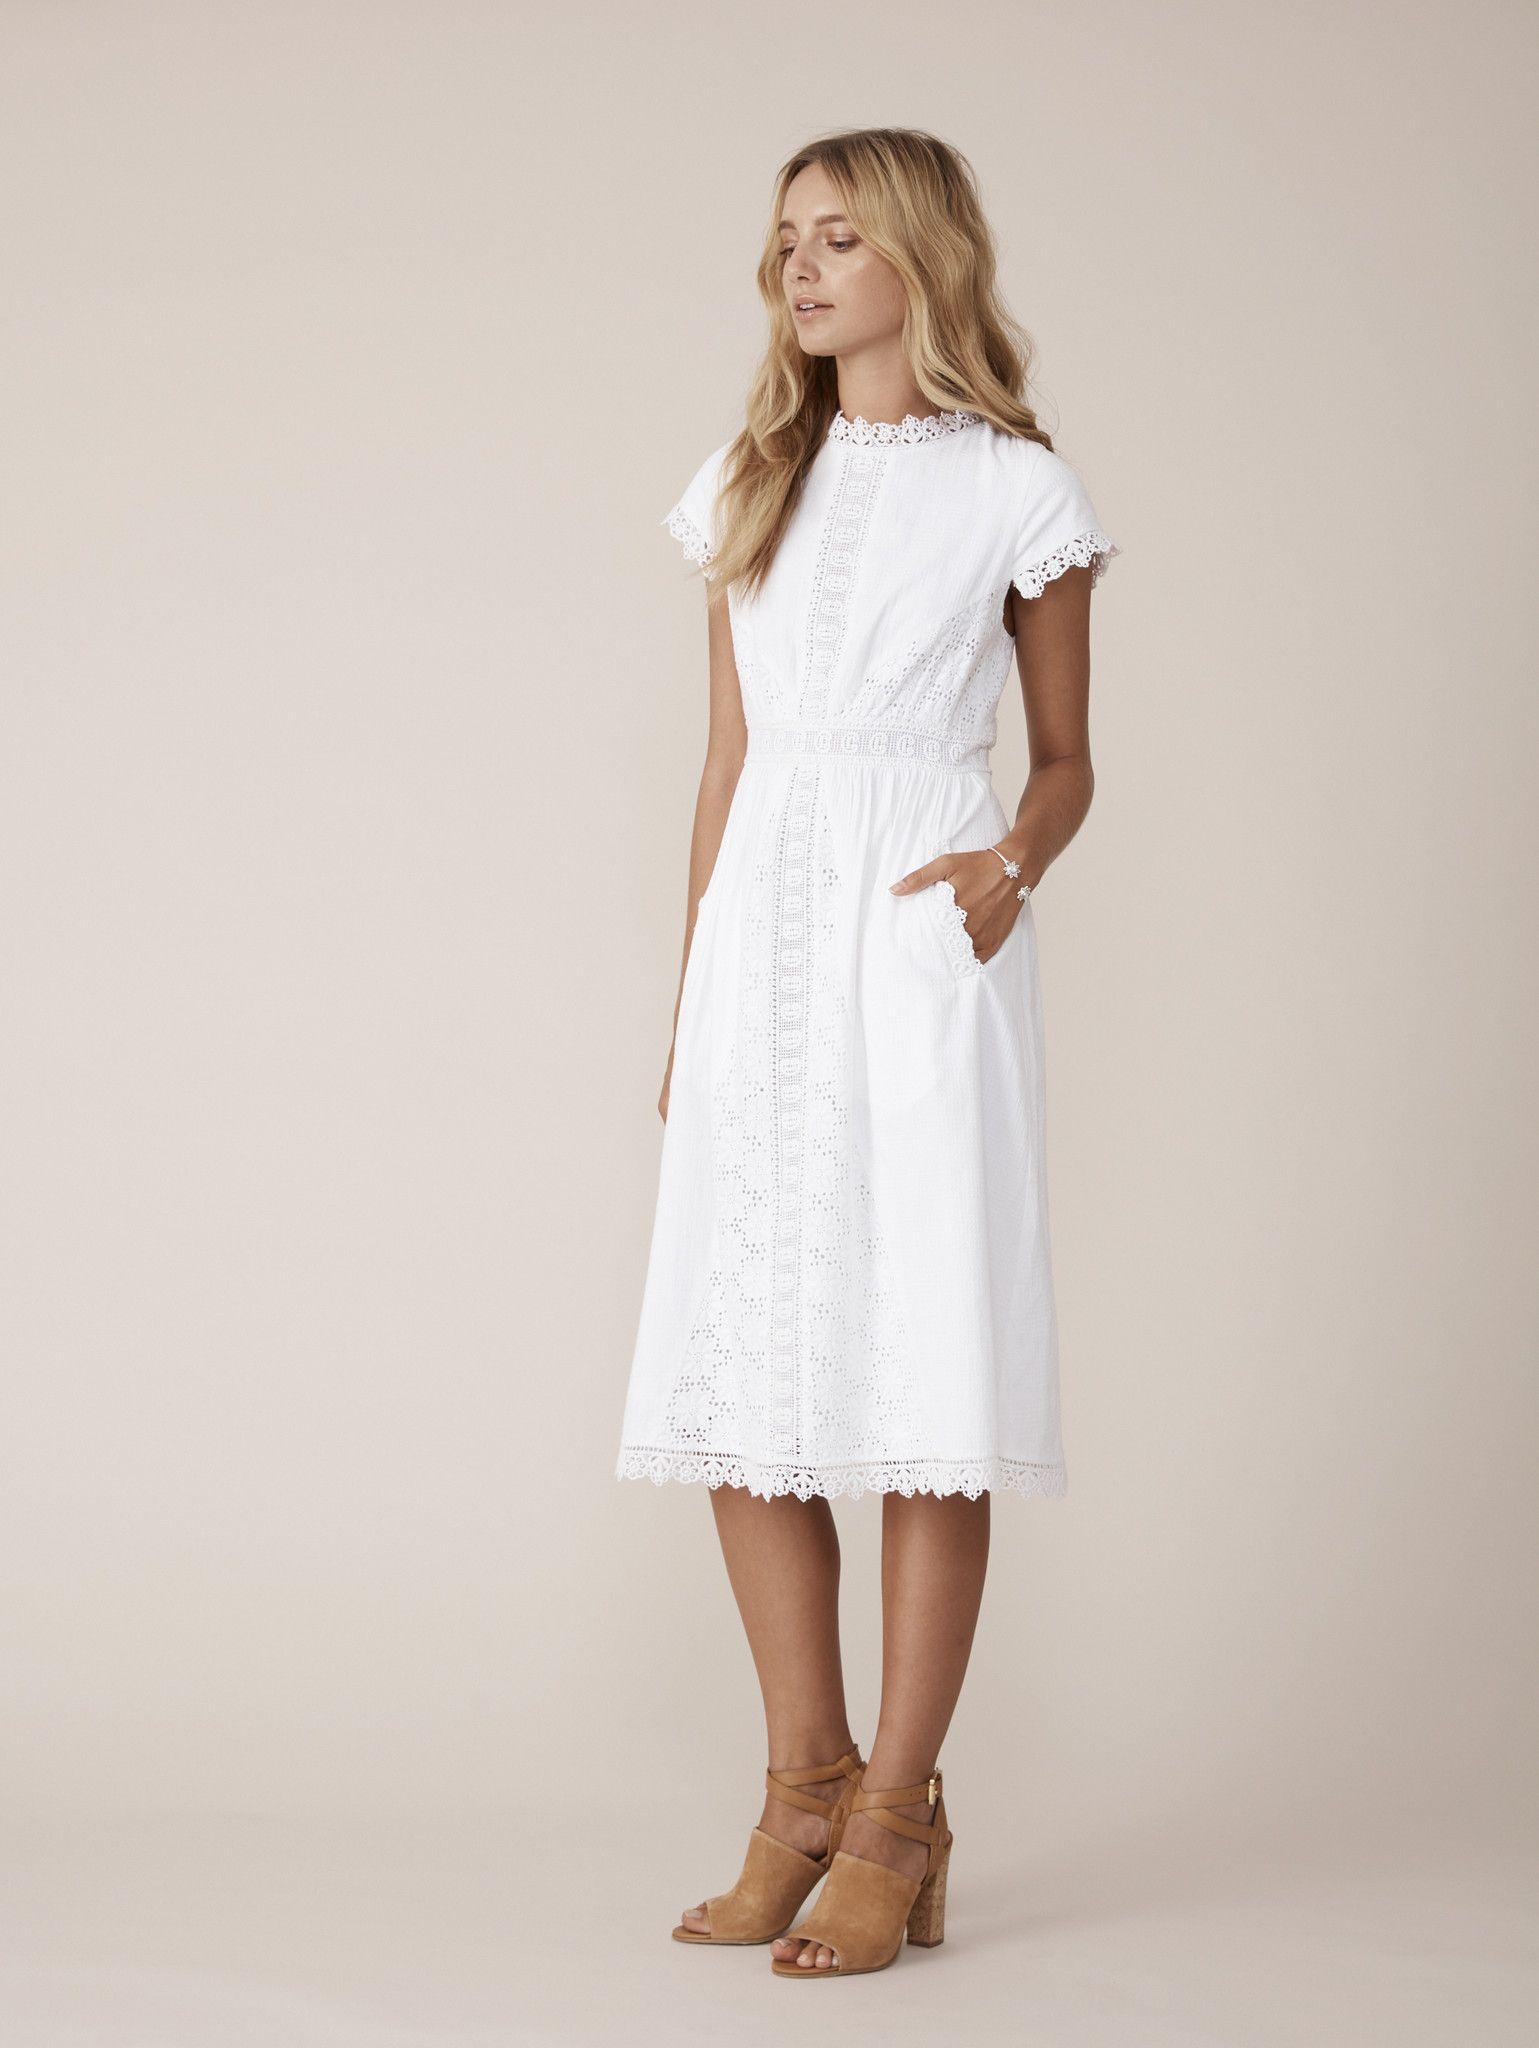 Binny - - Victoria Simple Cotton Broderie Dress | Binny ...